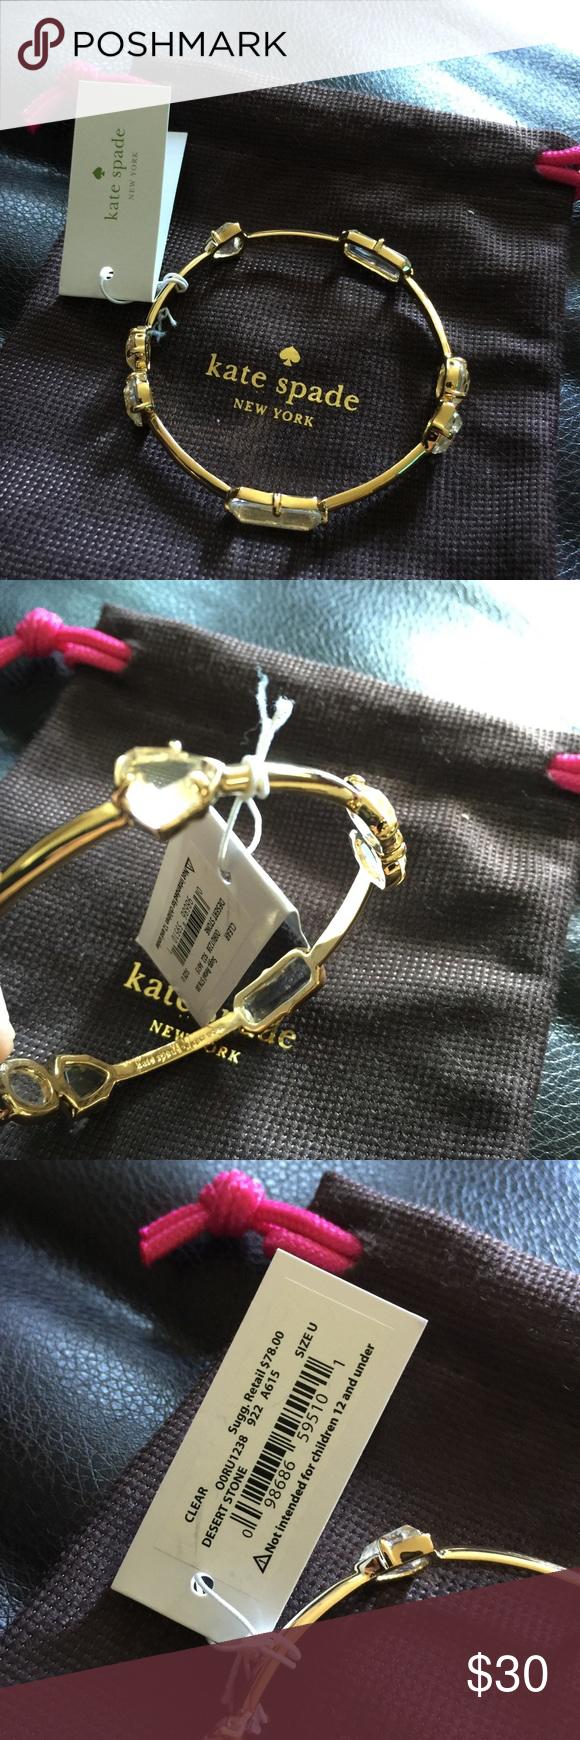 NWT KAYE SPADE BANGLE New with tag pretty nice kate spade bangle . kate spade Jewelry Bracelets